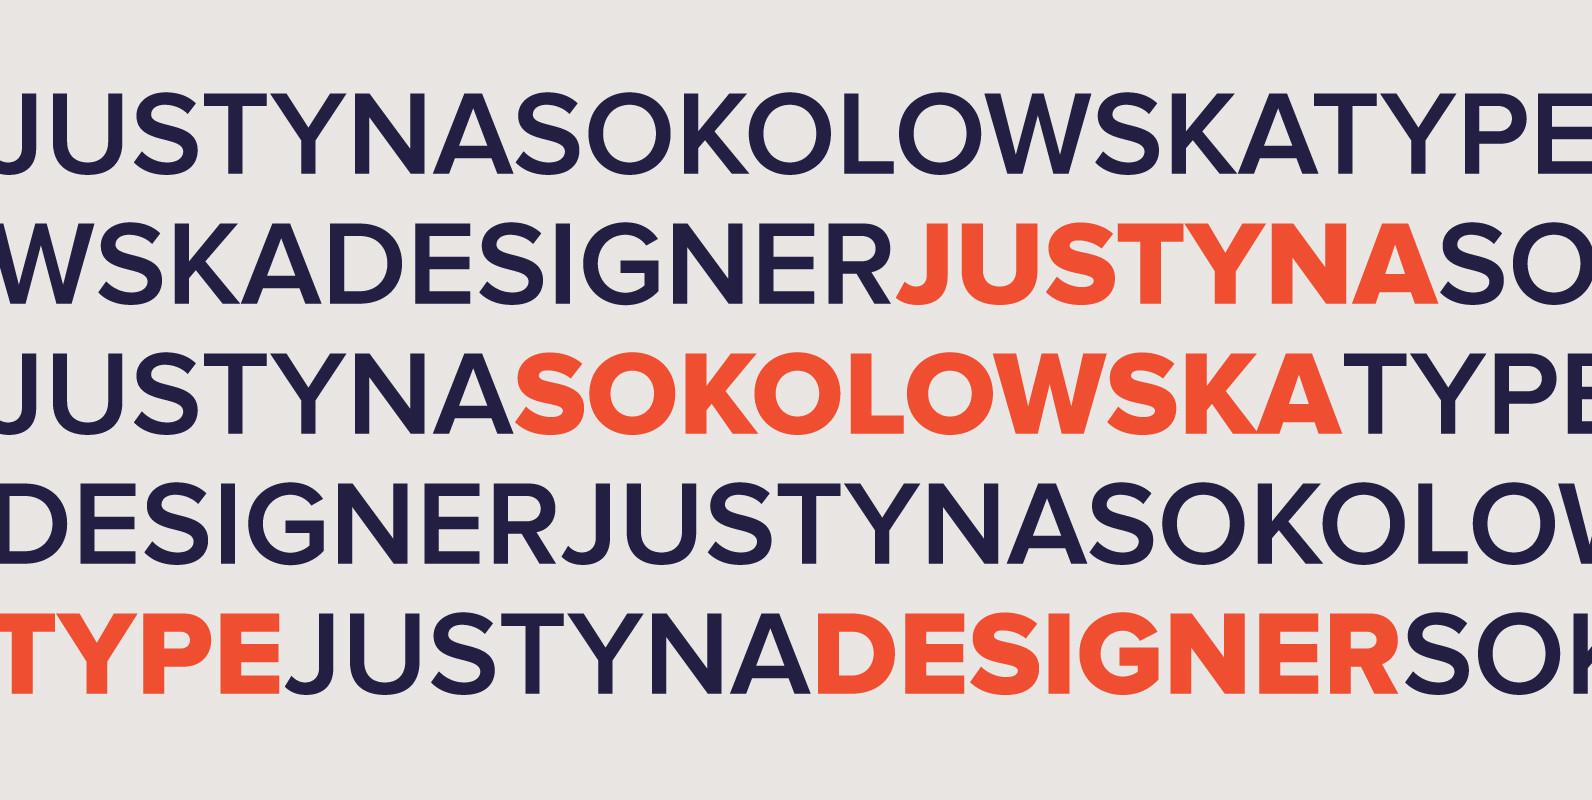 Justyna Sokolowska